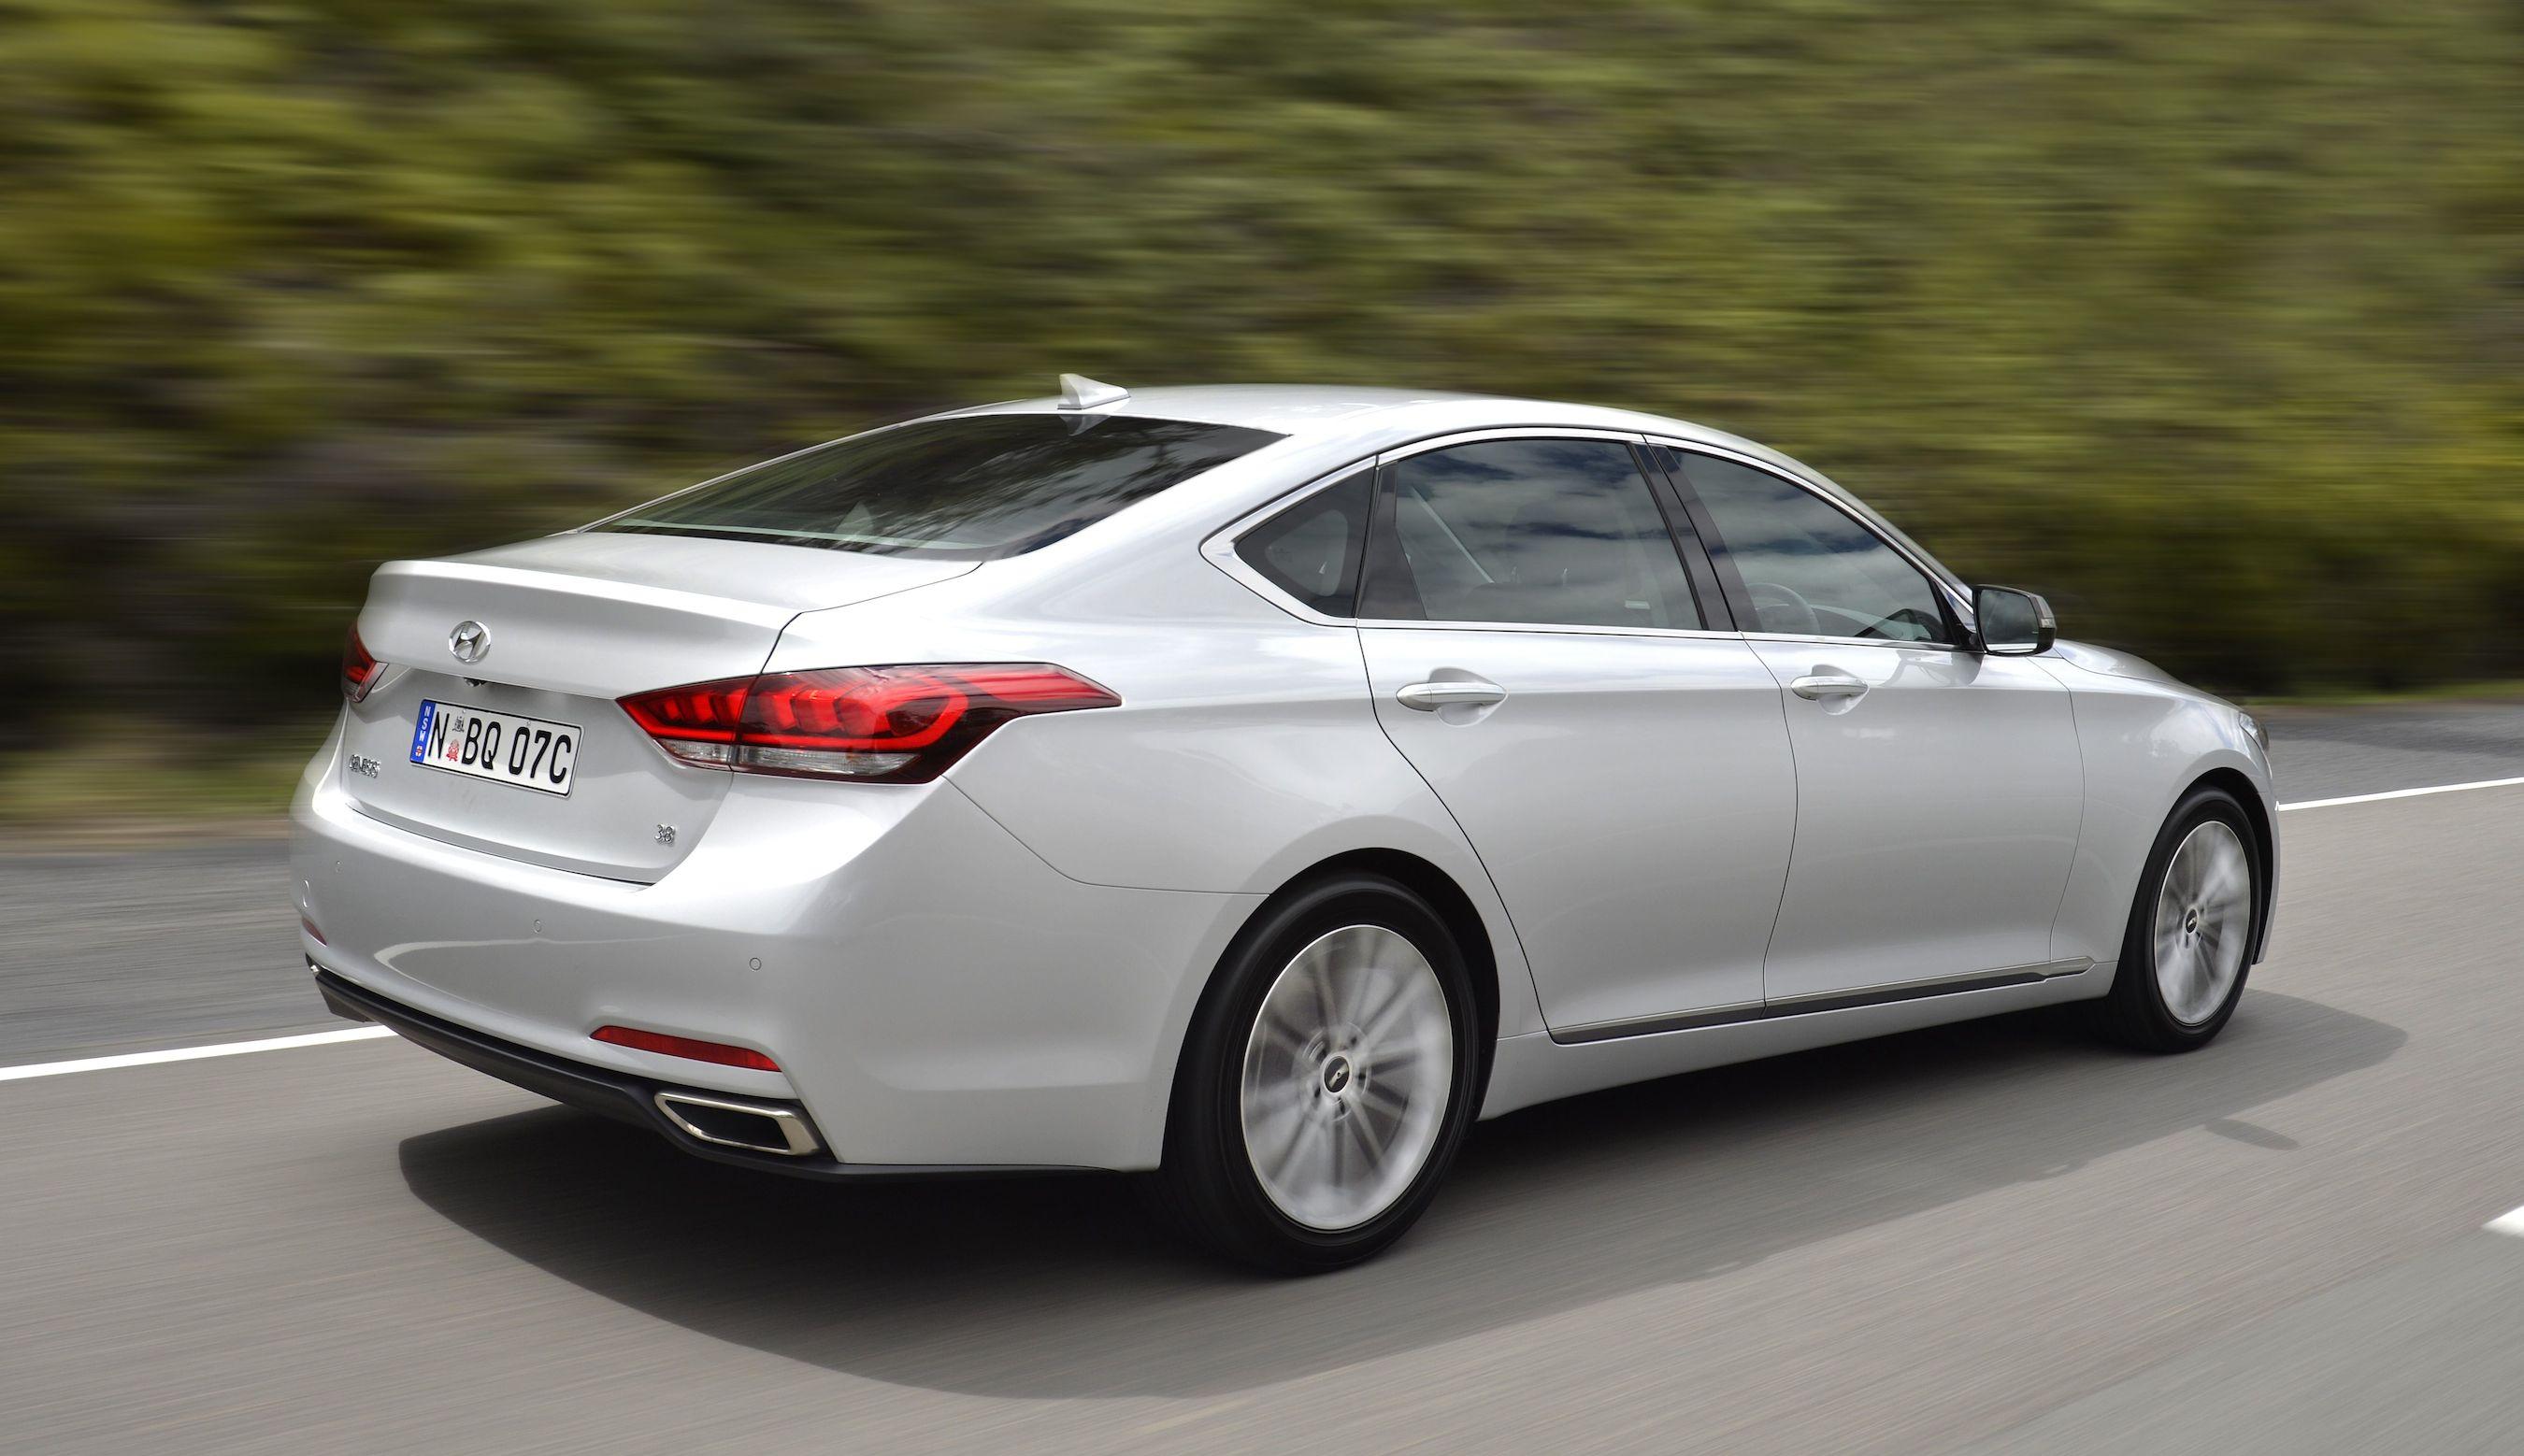 Hyundai Genesis An Image Maker Not A Loss Maker Says